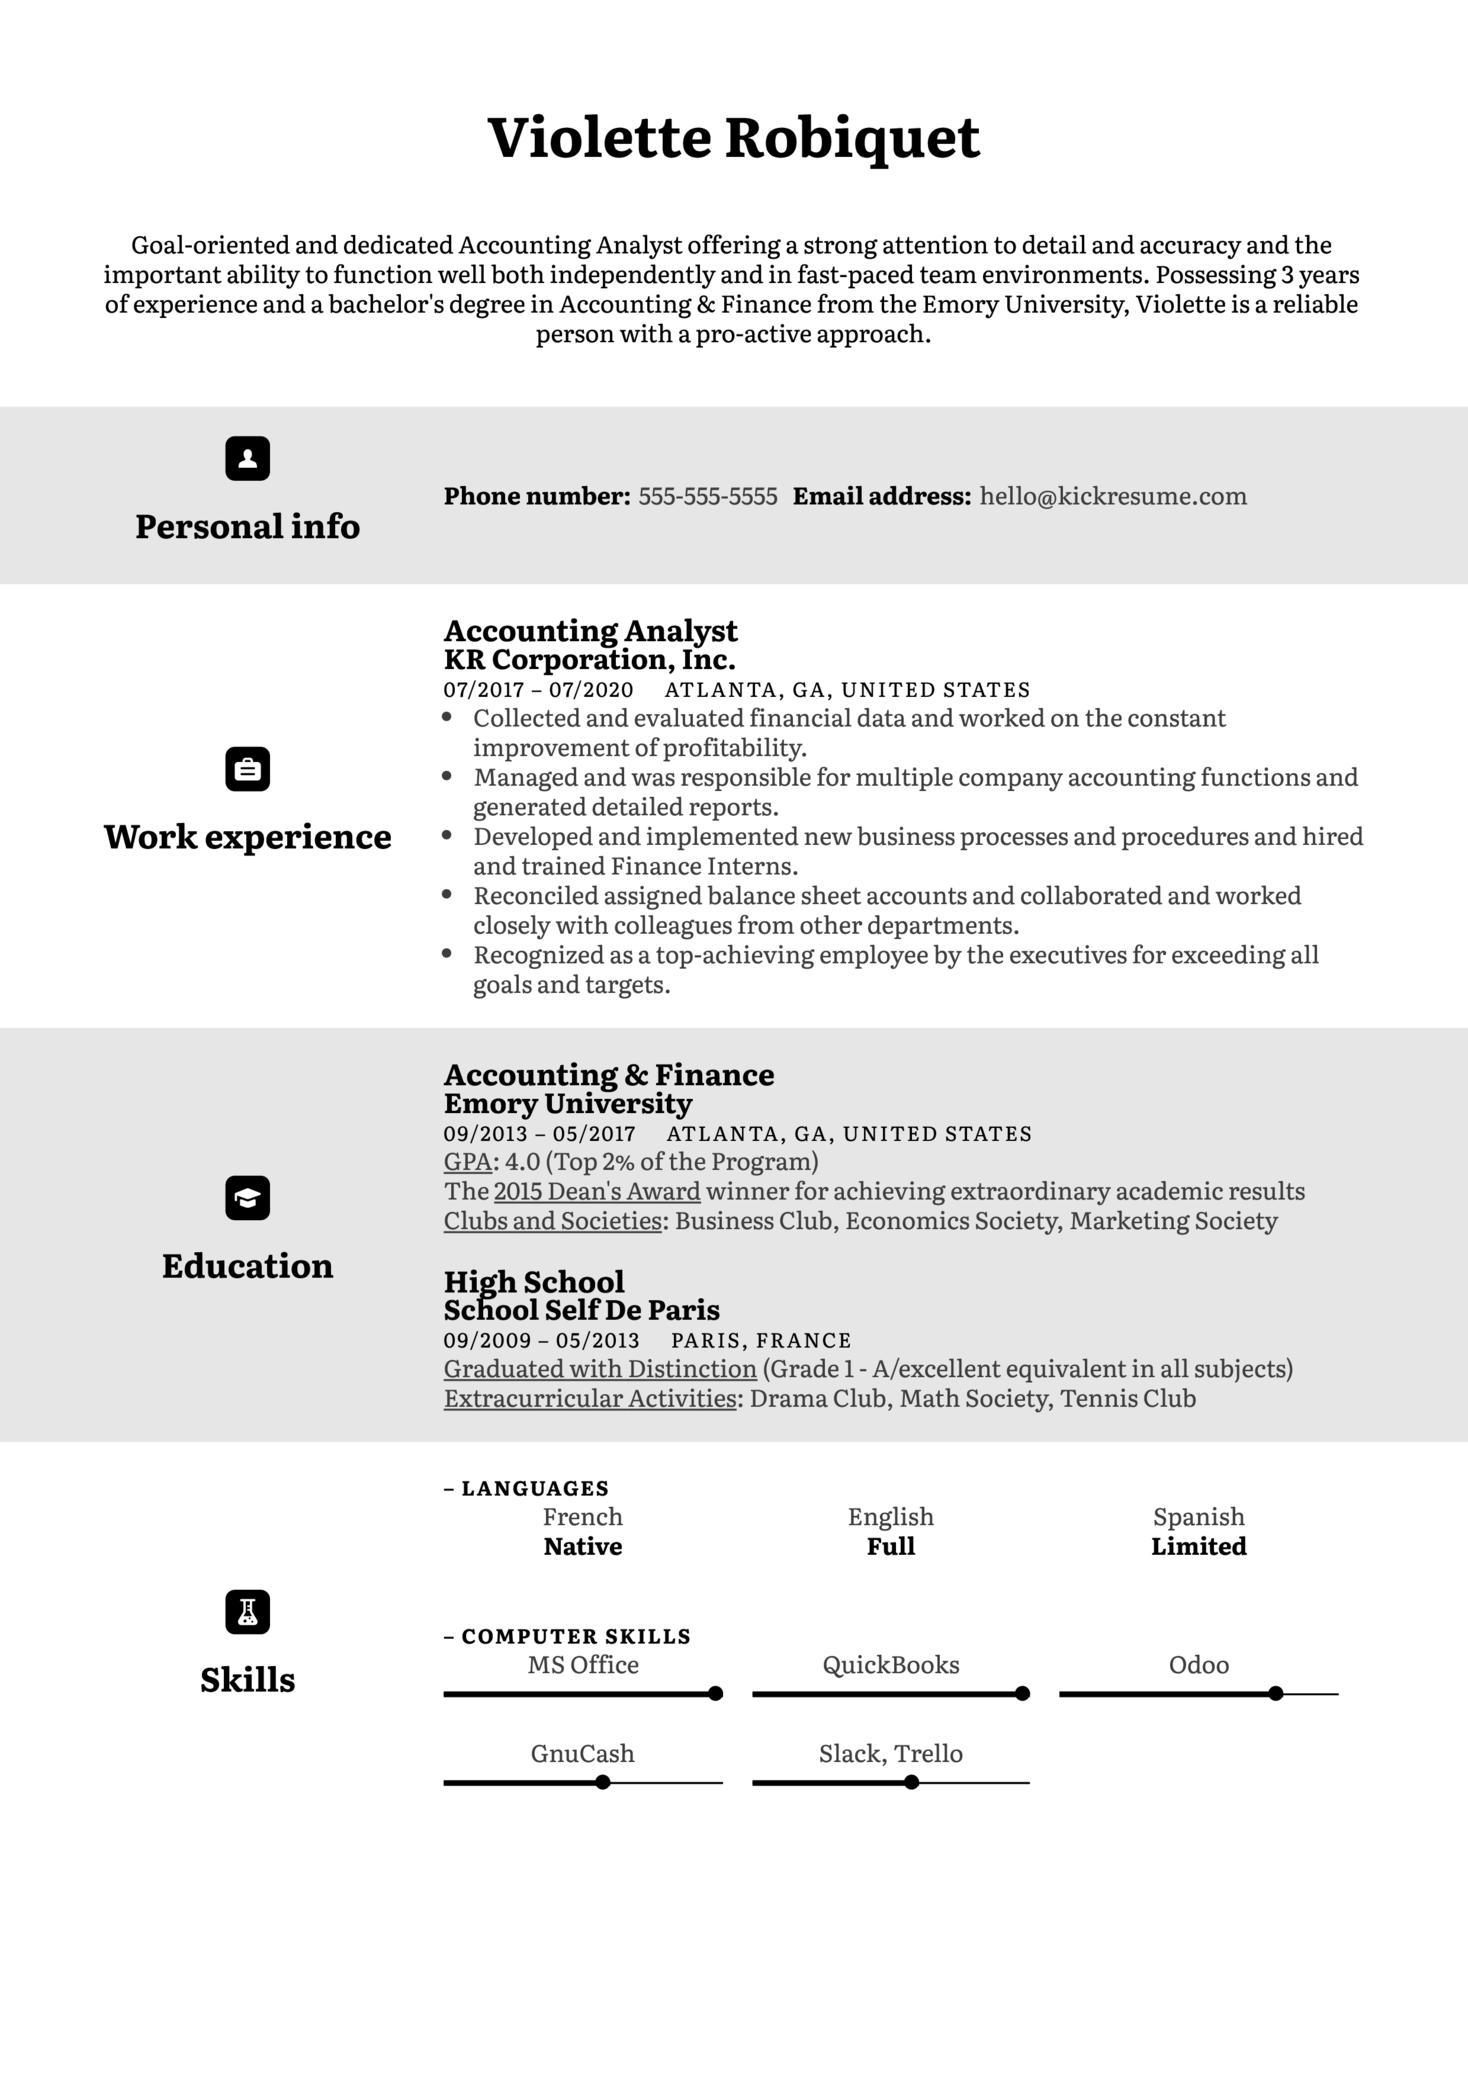 English CV Example (Part 1)